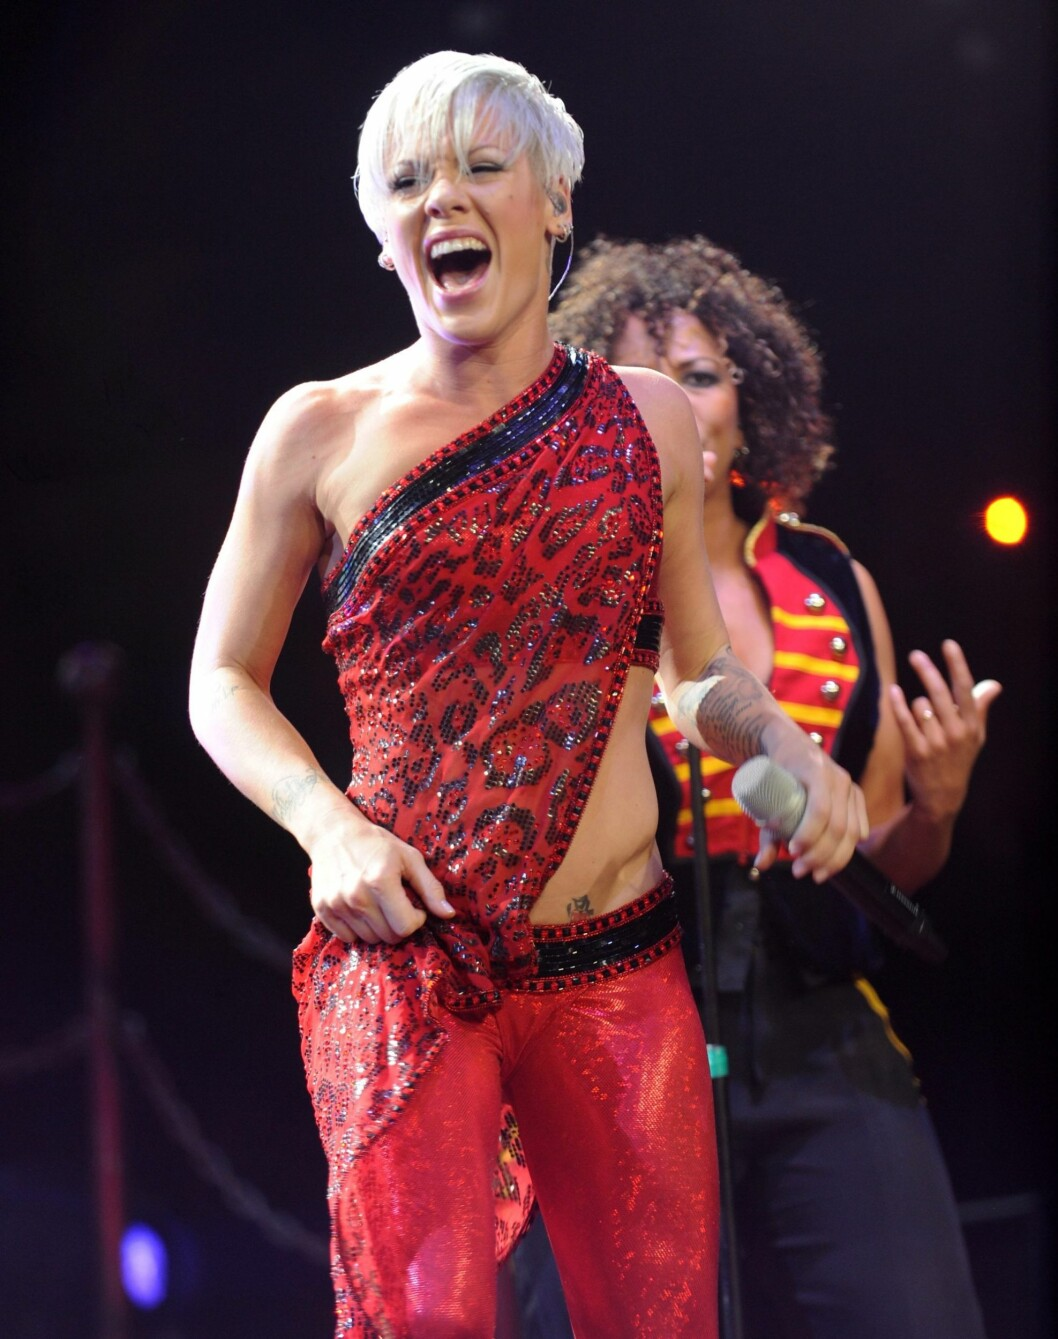 Pink på scenen i et utfordrende og tøft antrekk. Foto: All Over Press